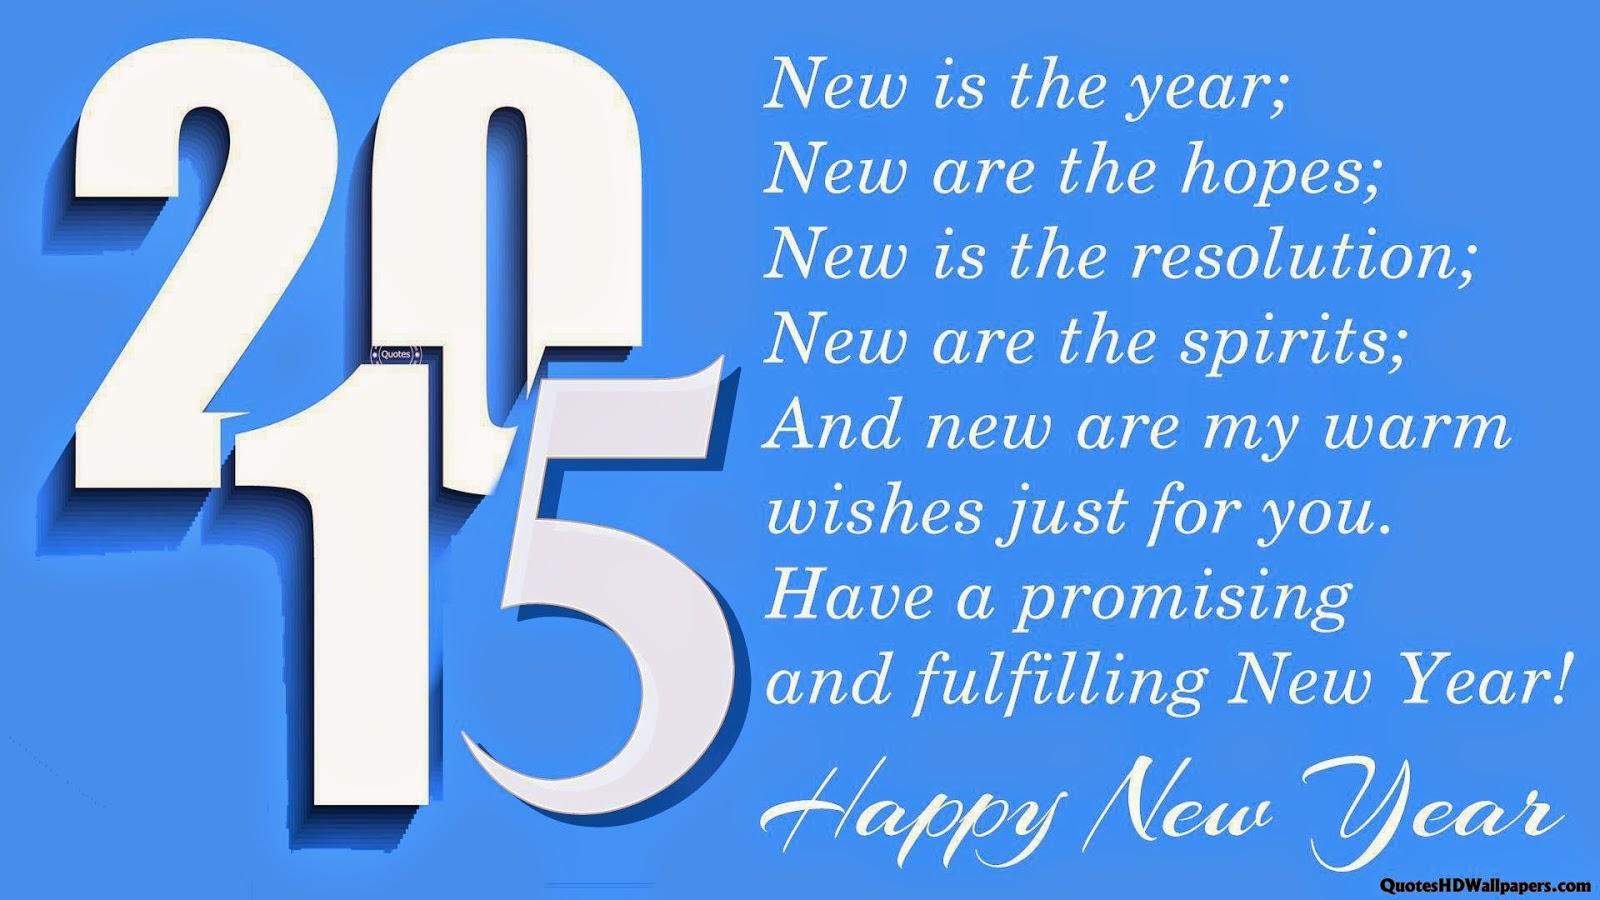 downloads happy new year